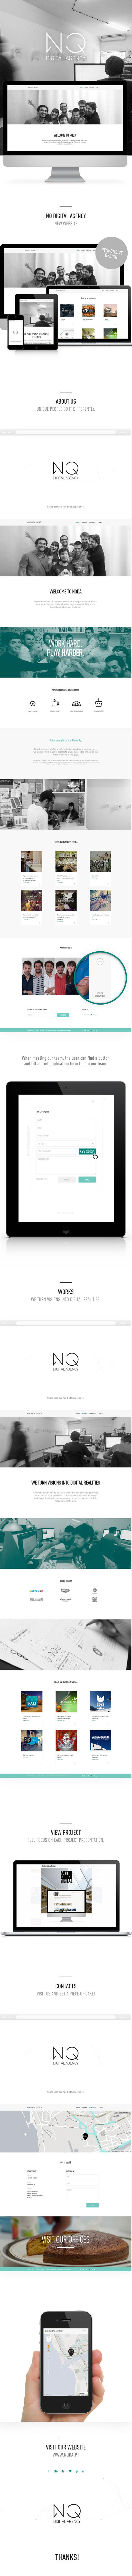 NQDA digital digital agency Responsive Responsive Design parallax Parallax Development Layout clean simple interactive creative